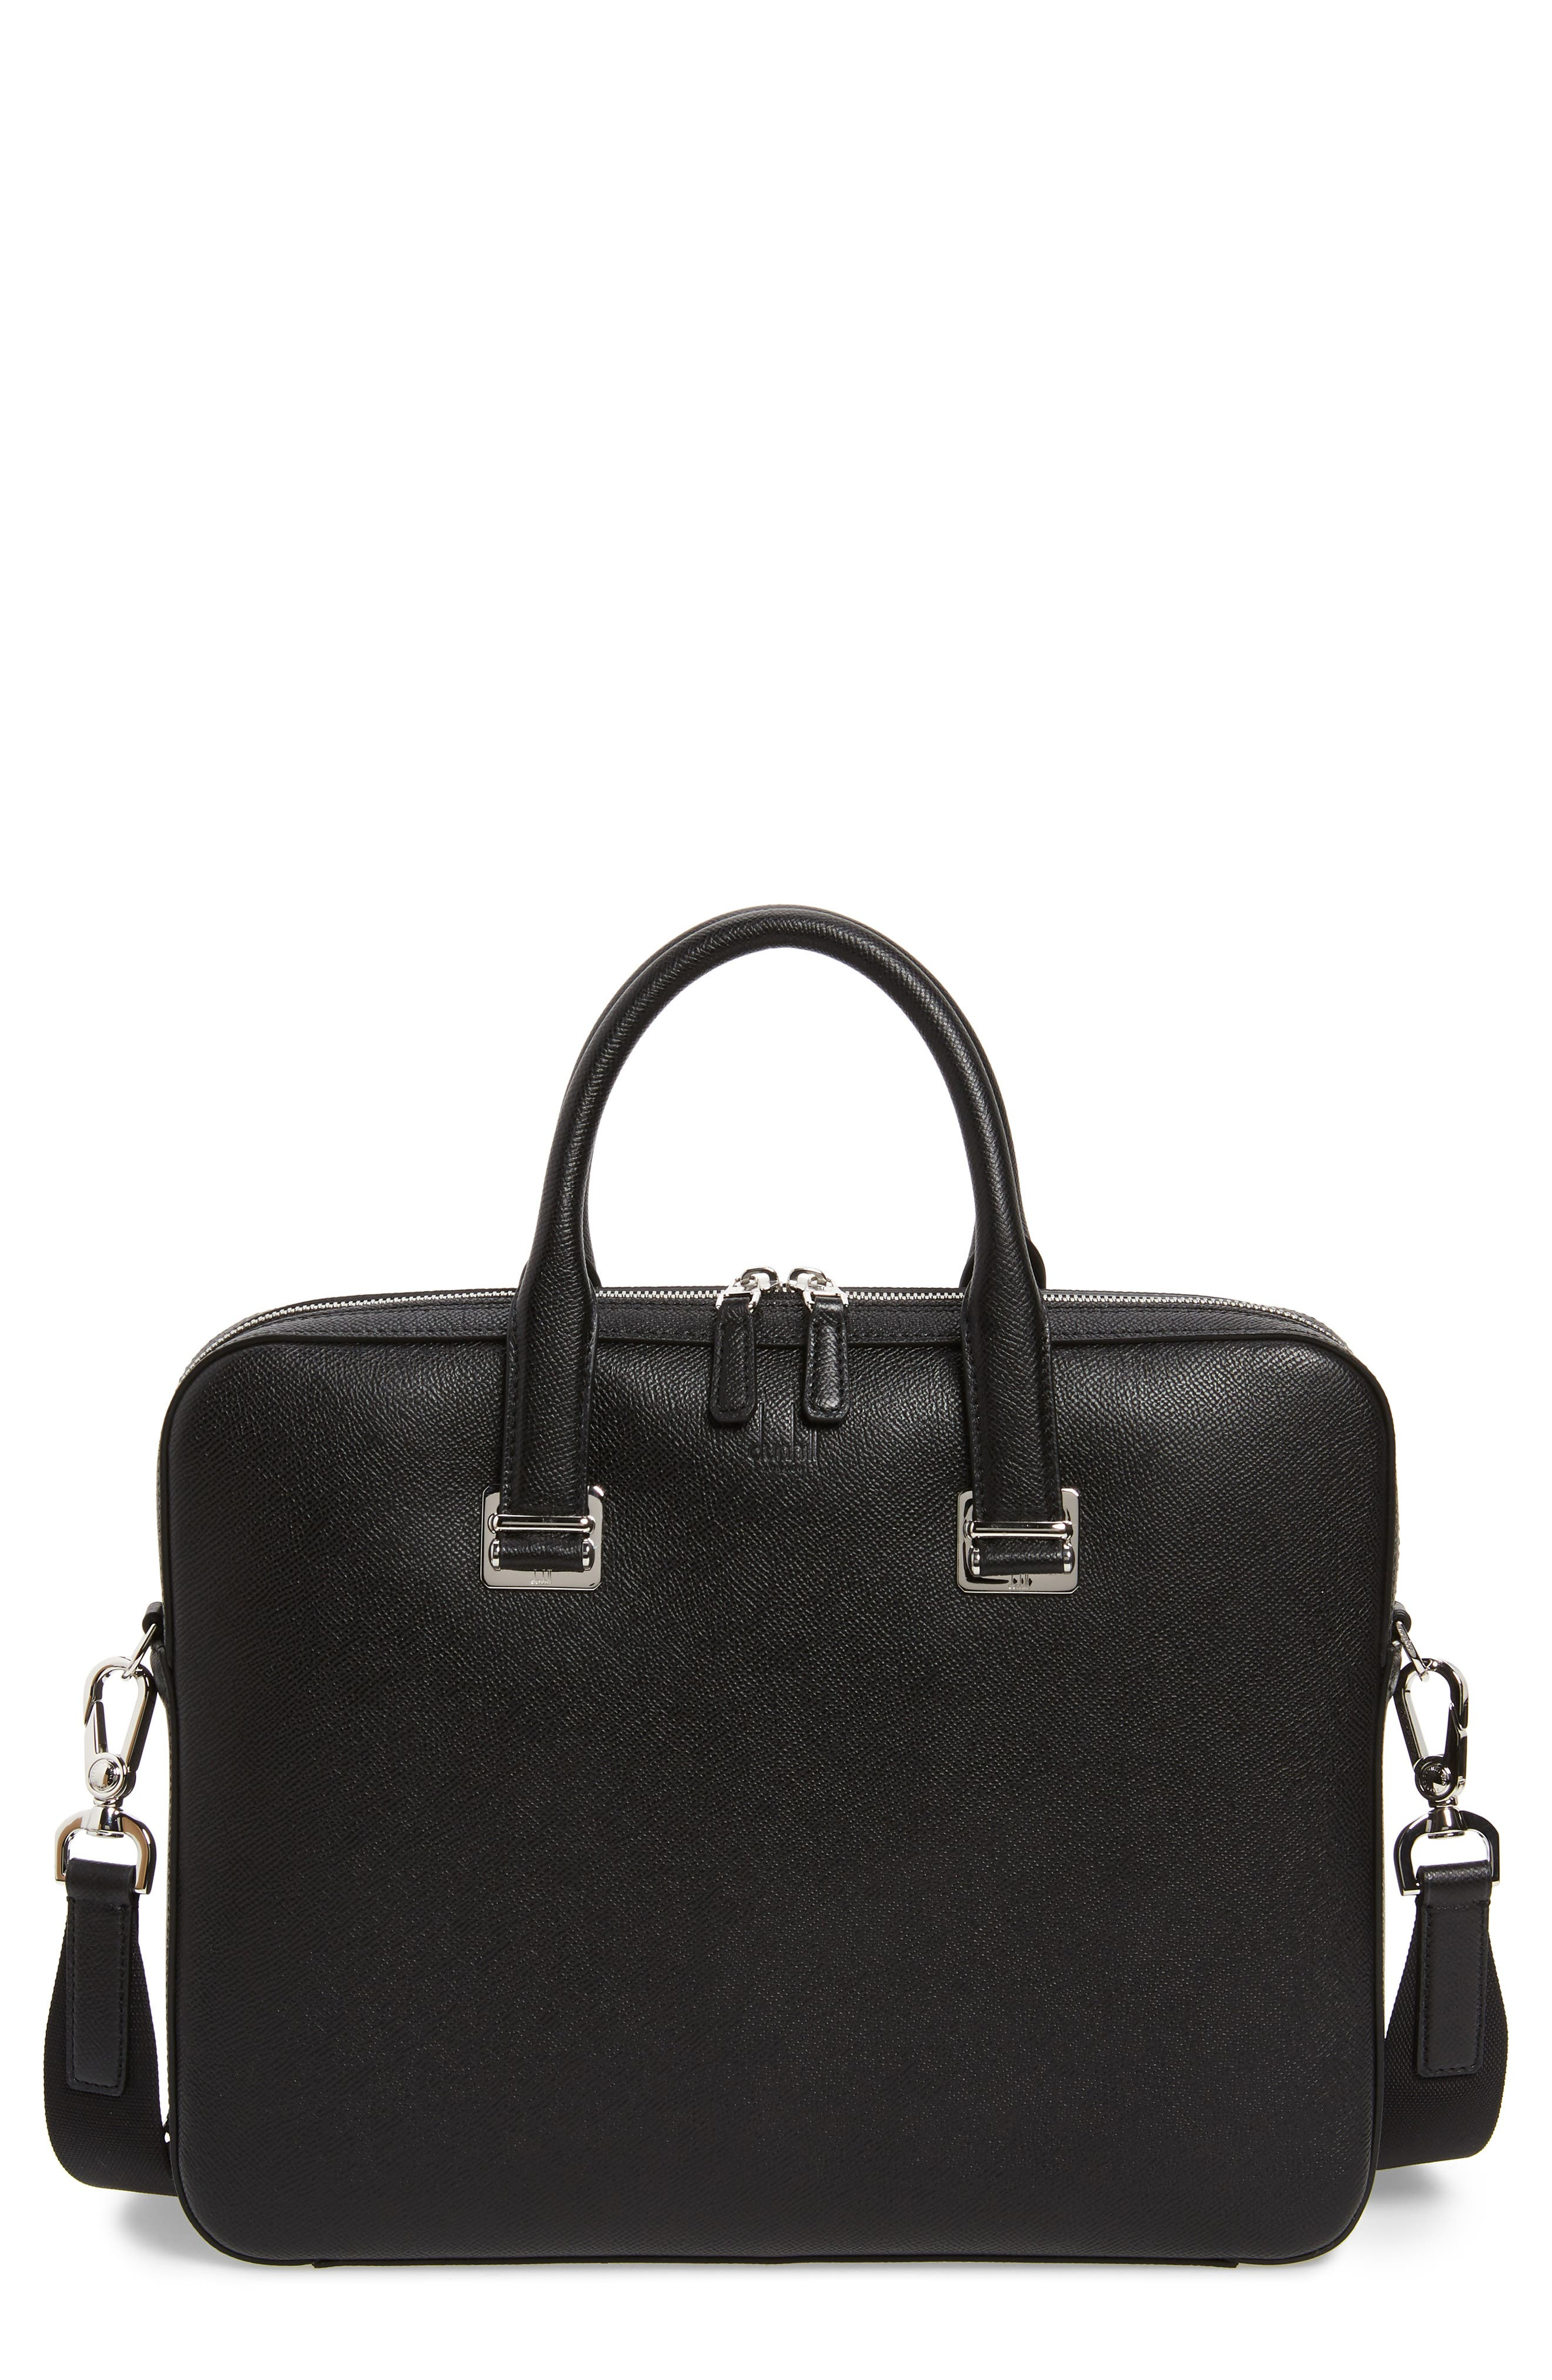 DUNHILL, Cadogan Leather Single Document Case, Main thumbnail 1, color, BLACK